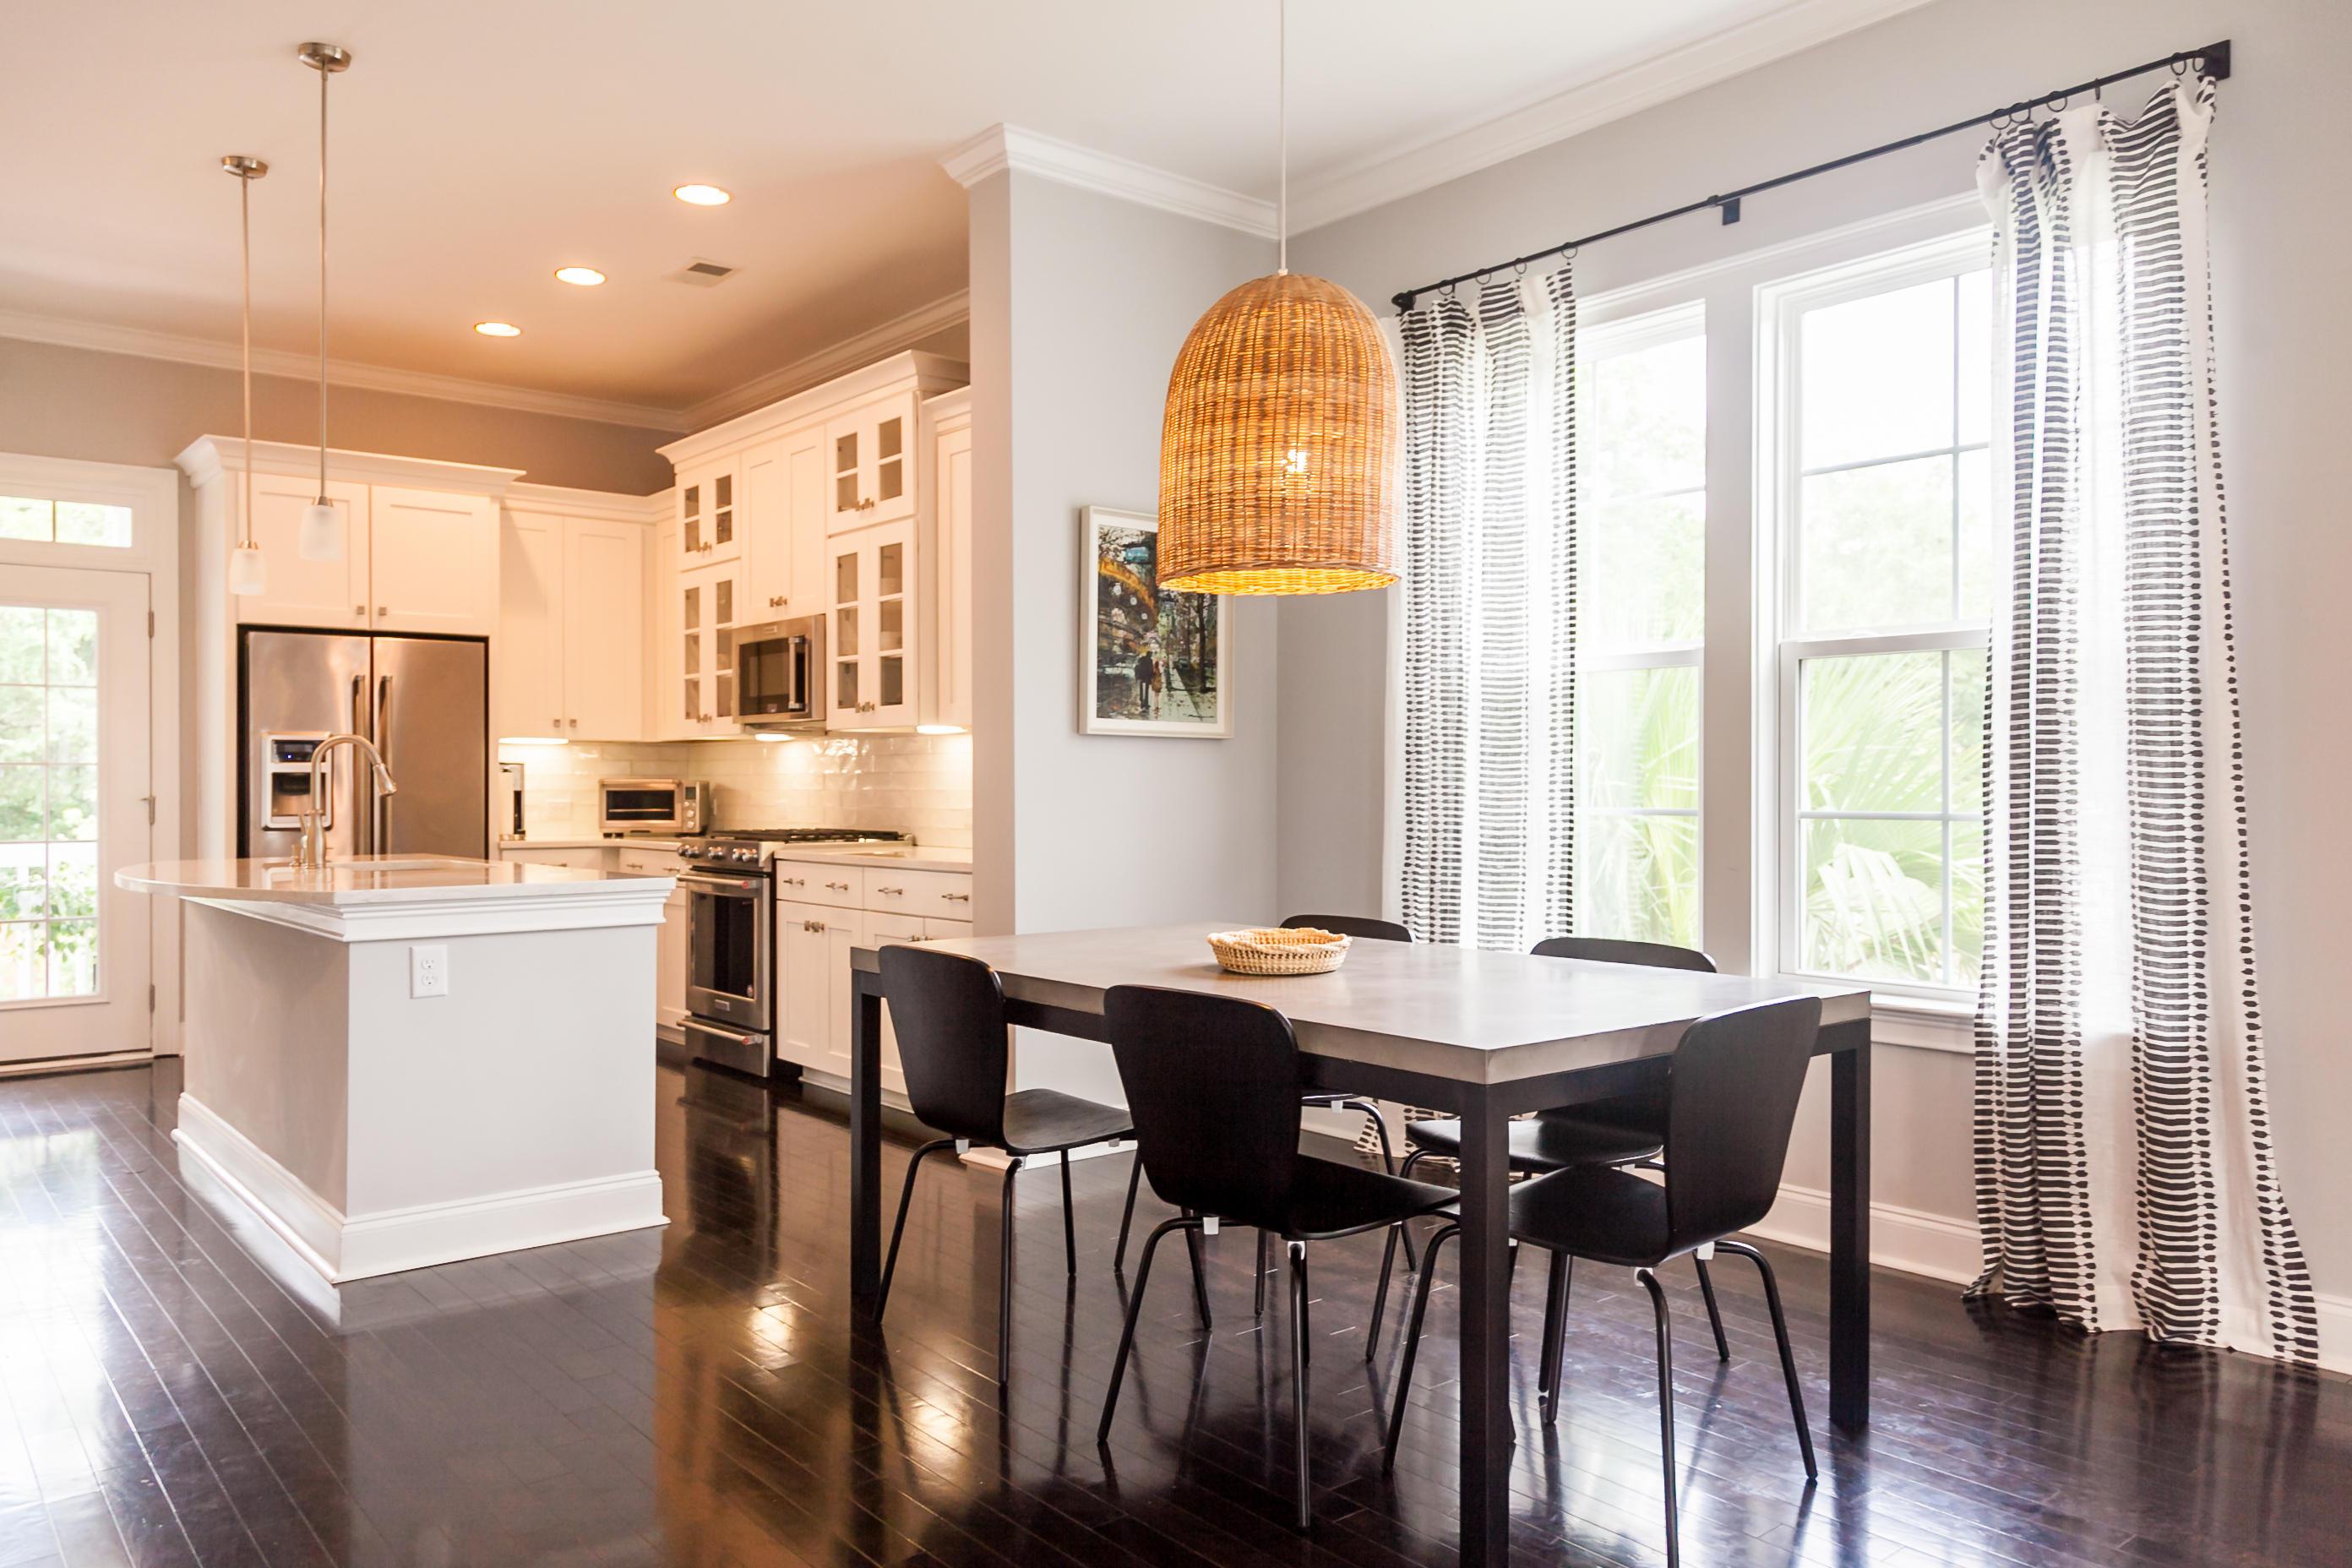 Whitesides Park Homes For Sale - 1319 Myrick, Mount Pleasant, SC - 10